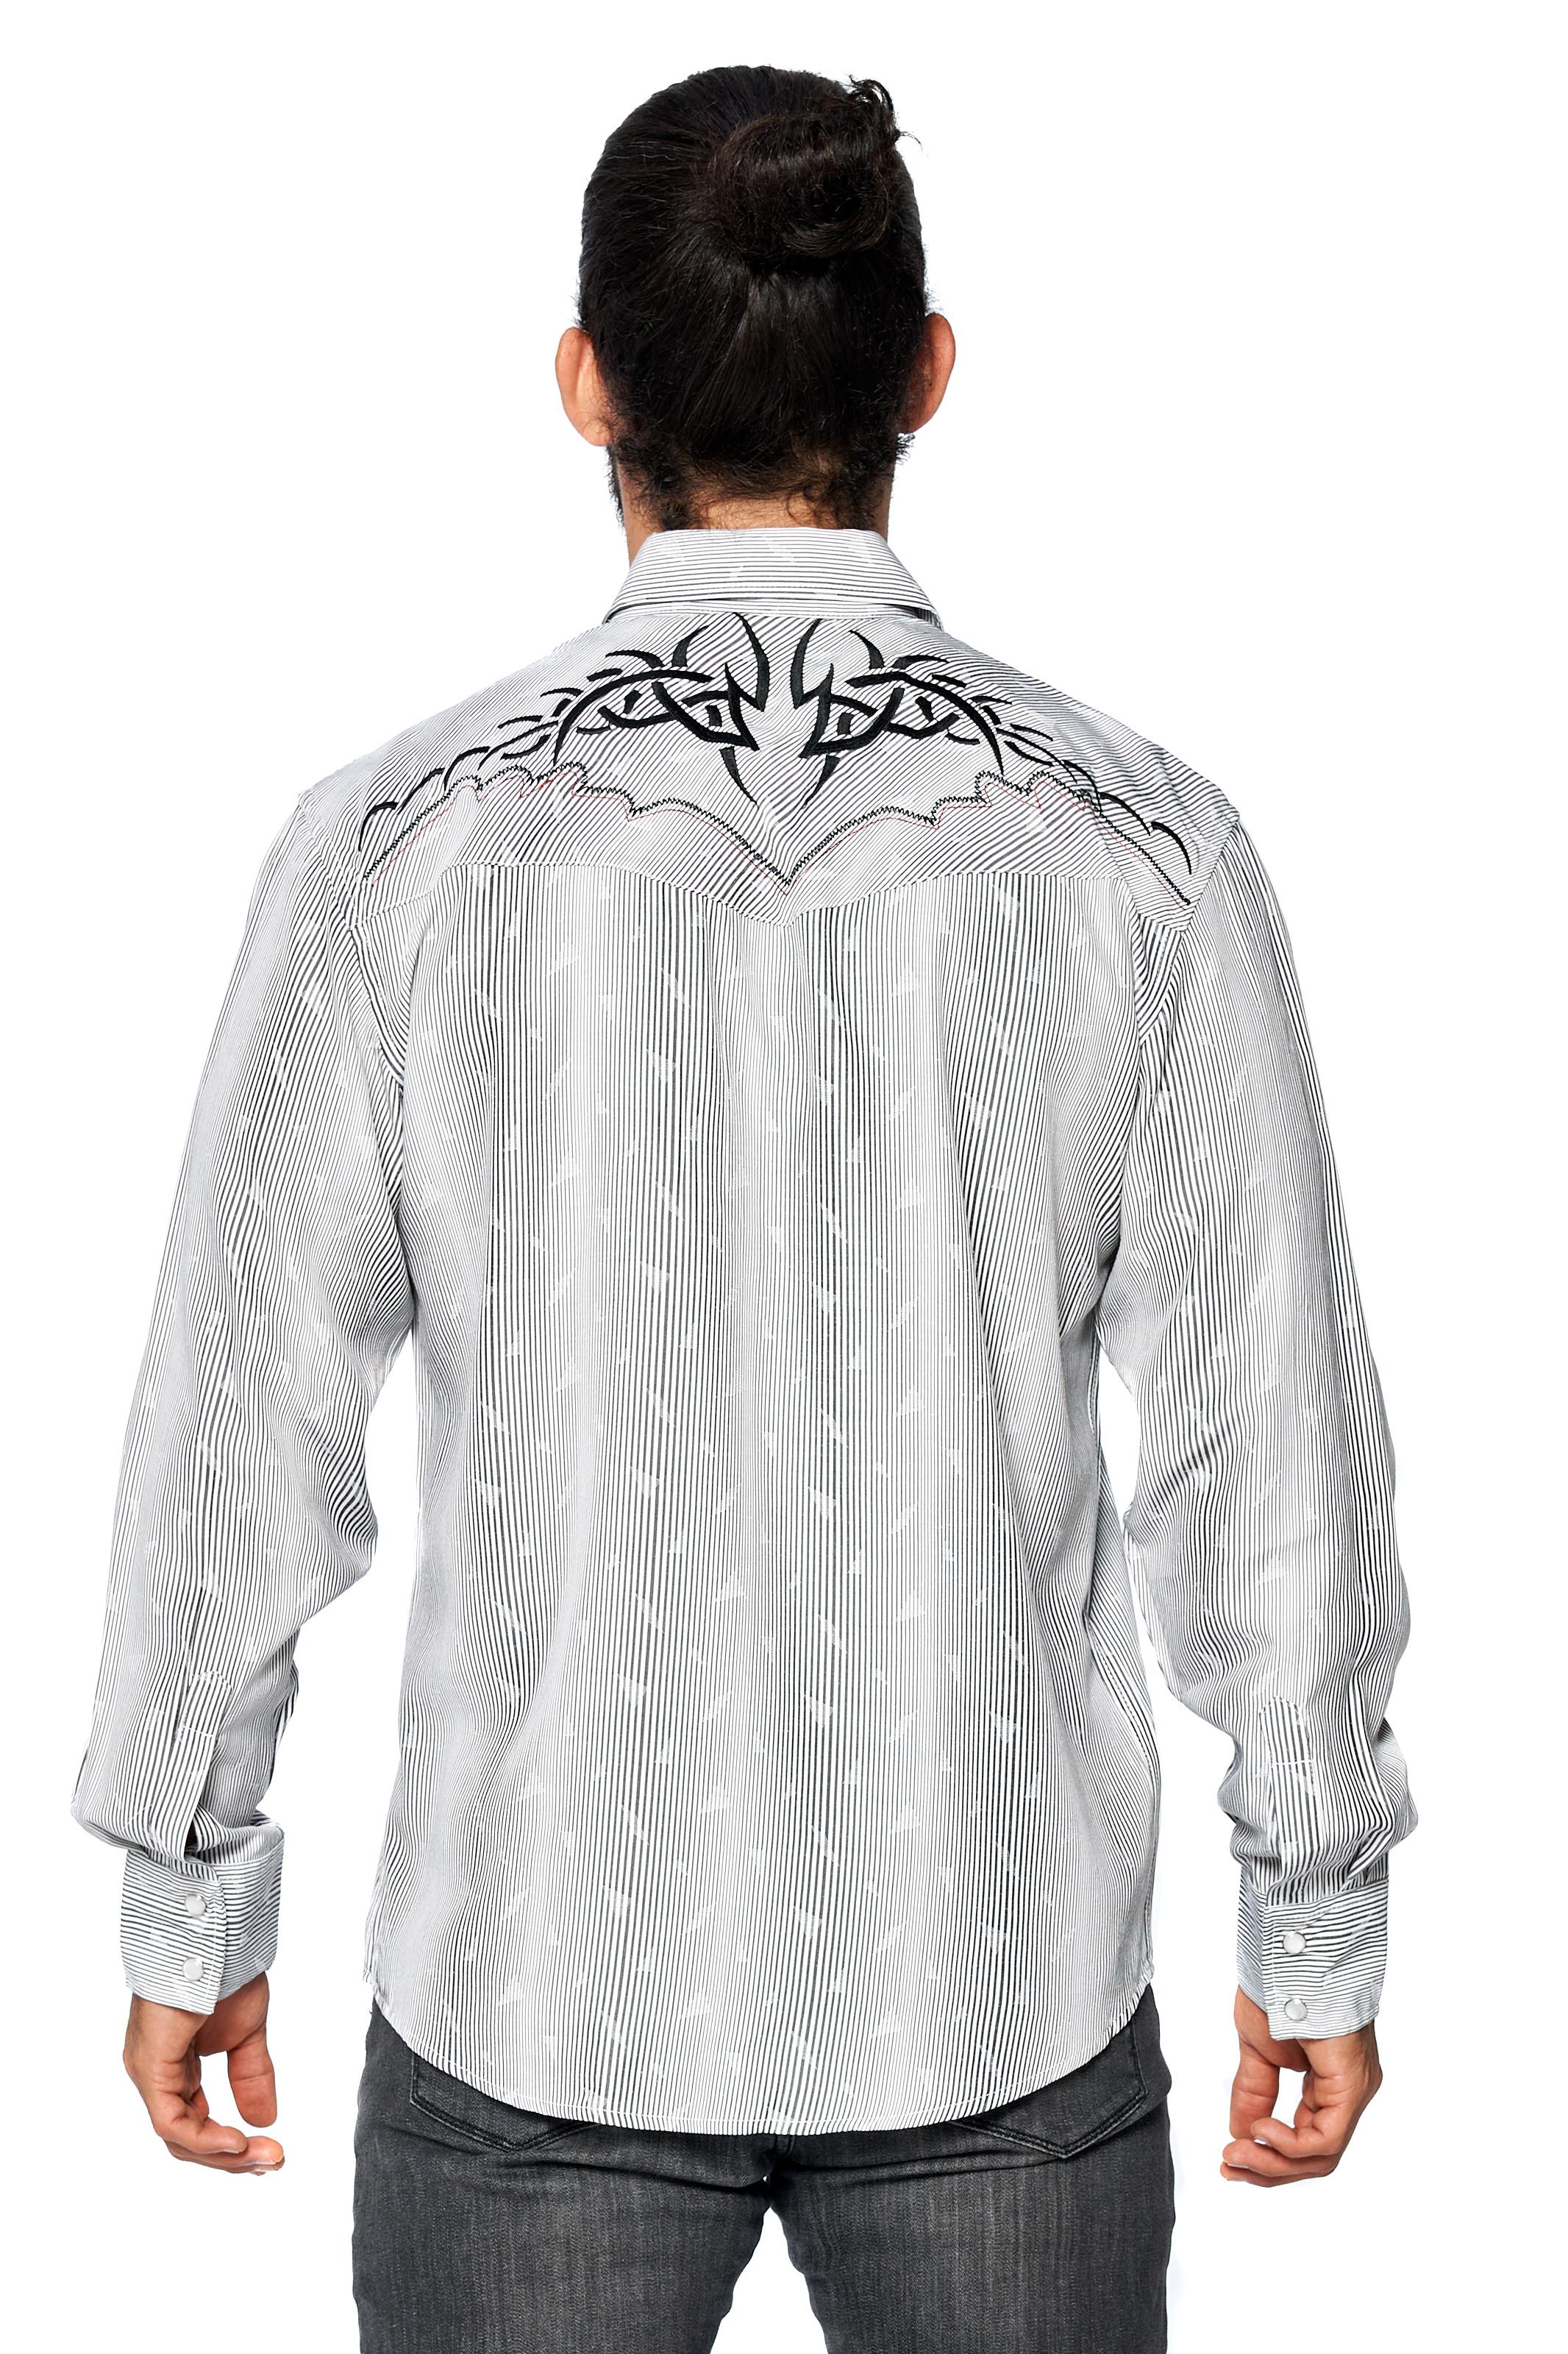 LW-Men-039-s-Pearl-Snap-Tribal-Stylish-Printed-Woven-Western-Vaquero-Rodeo-Shirt thumbnail 60